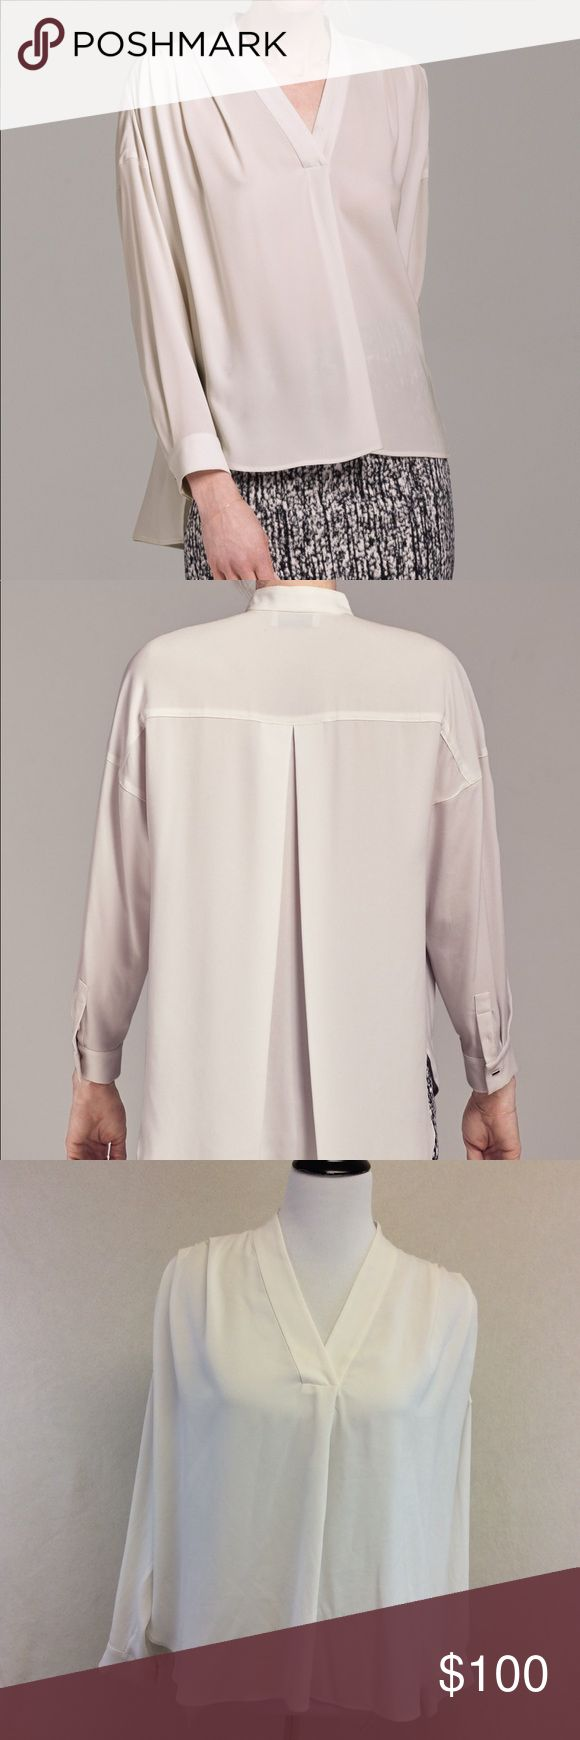 "M MM LAFLEUR white Morrison shirt Brand: M.M. Lafleur Style: Morrison shirt  Size: medium  Approximate Measurements: pit to pit 26.5"" shoulder to hem 24""-27"" Material: 80% cellulose acetate 20% polyester Features: hi lo hem, pleated shoulders, long cuff sleeves, v neck Condition: excellent condition MM Lafleur Tops Blouses"